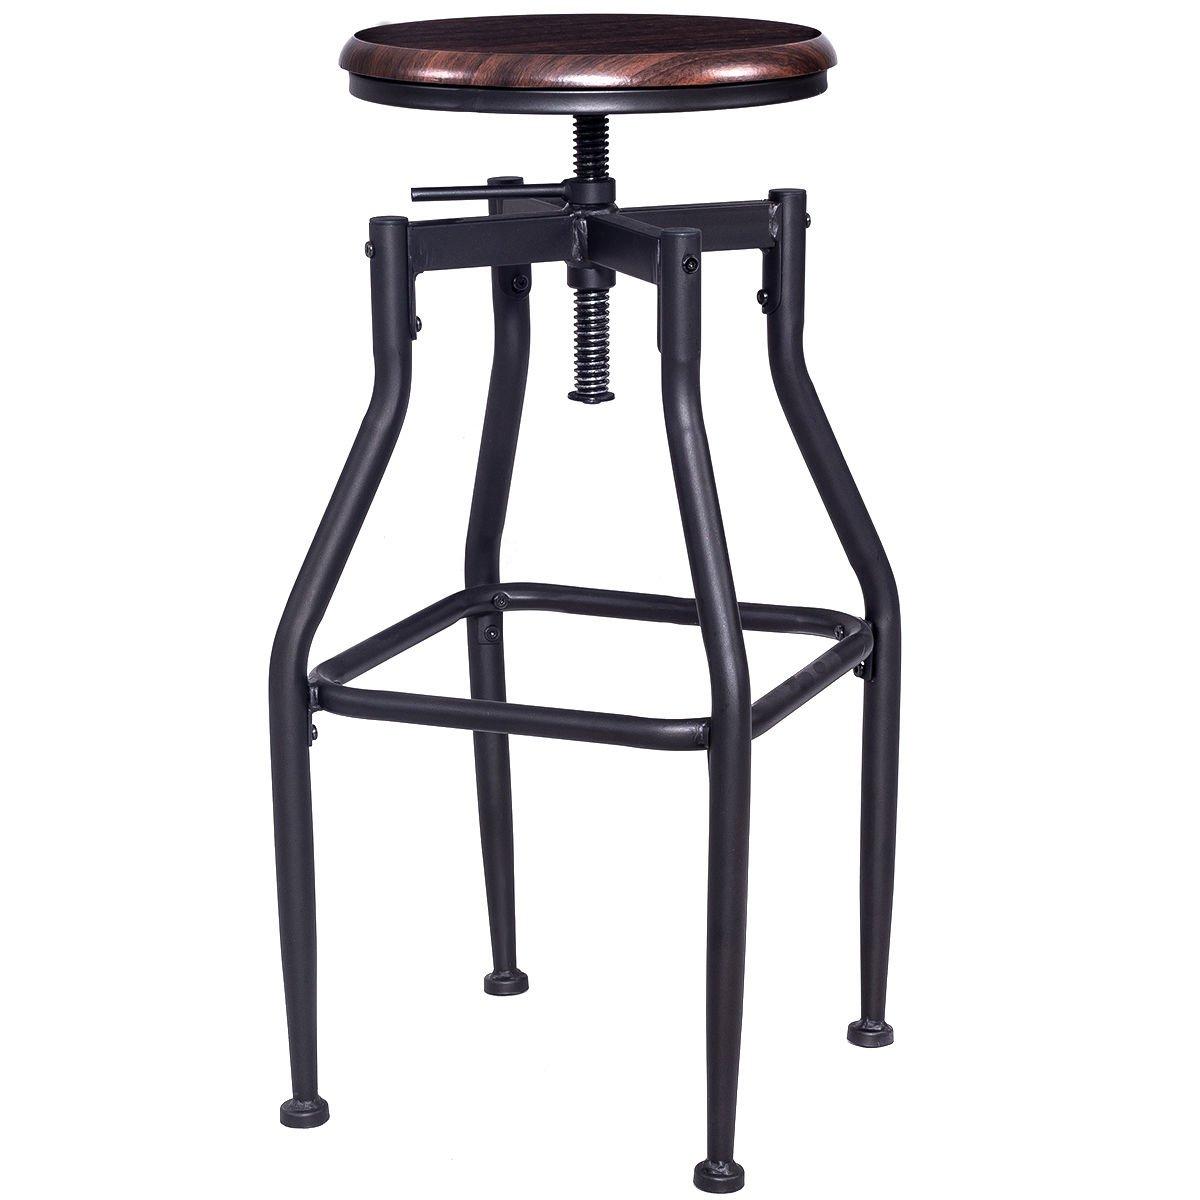 New Vintage Bar Stool Metal Design Wood Top Height Adjustable Swivel Industrial